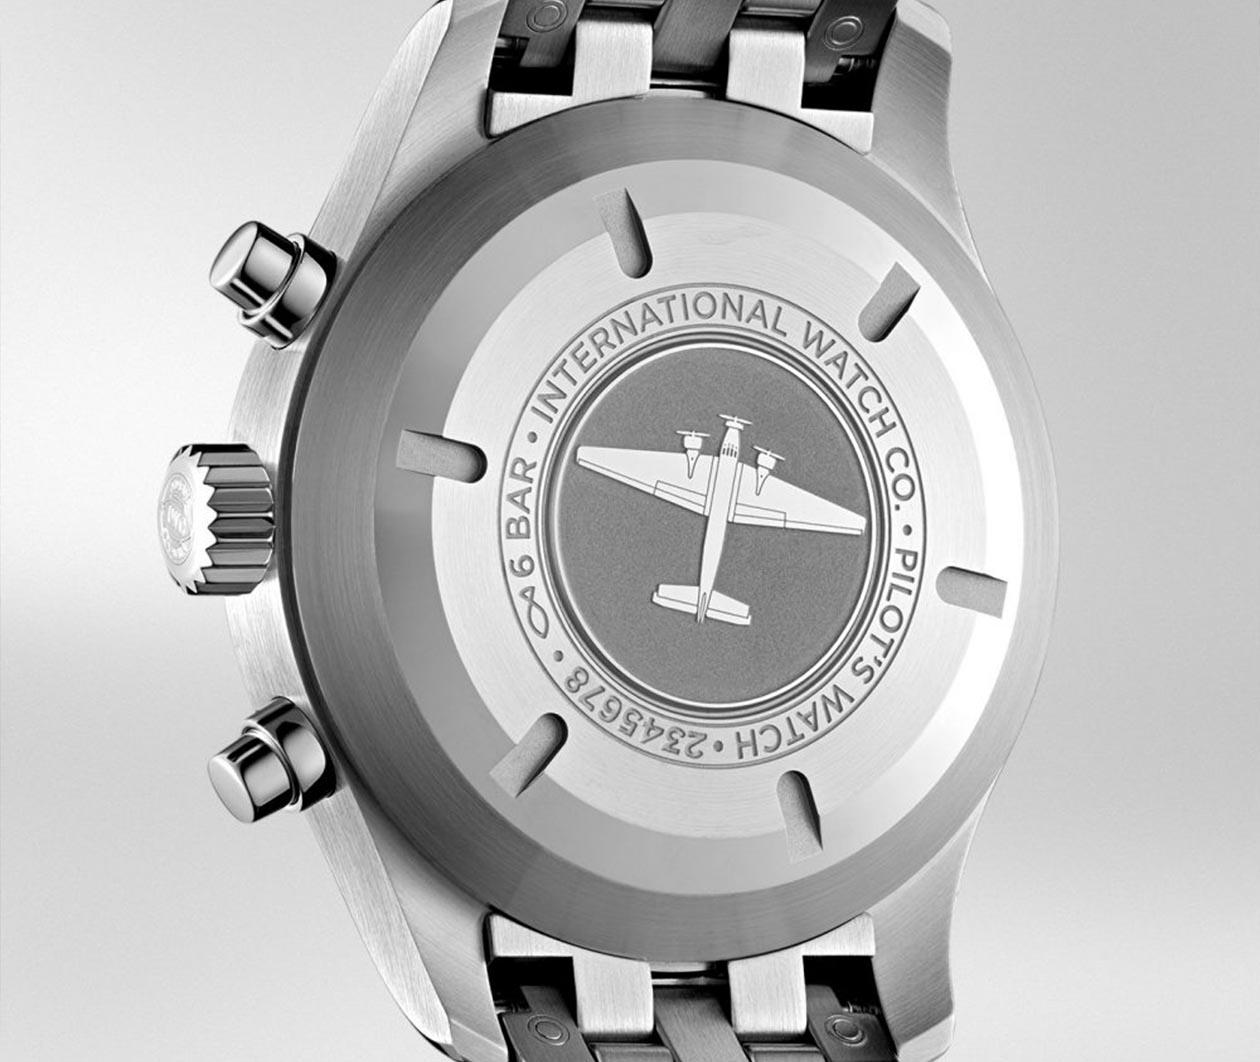 IWC PilotsWatch Chronograph IW377710 Carousel 5 FINAL